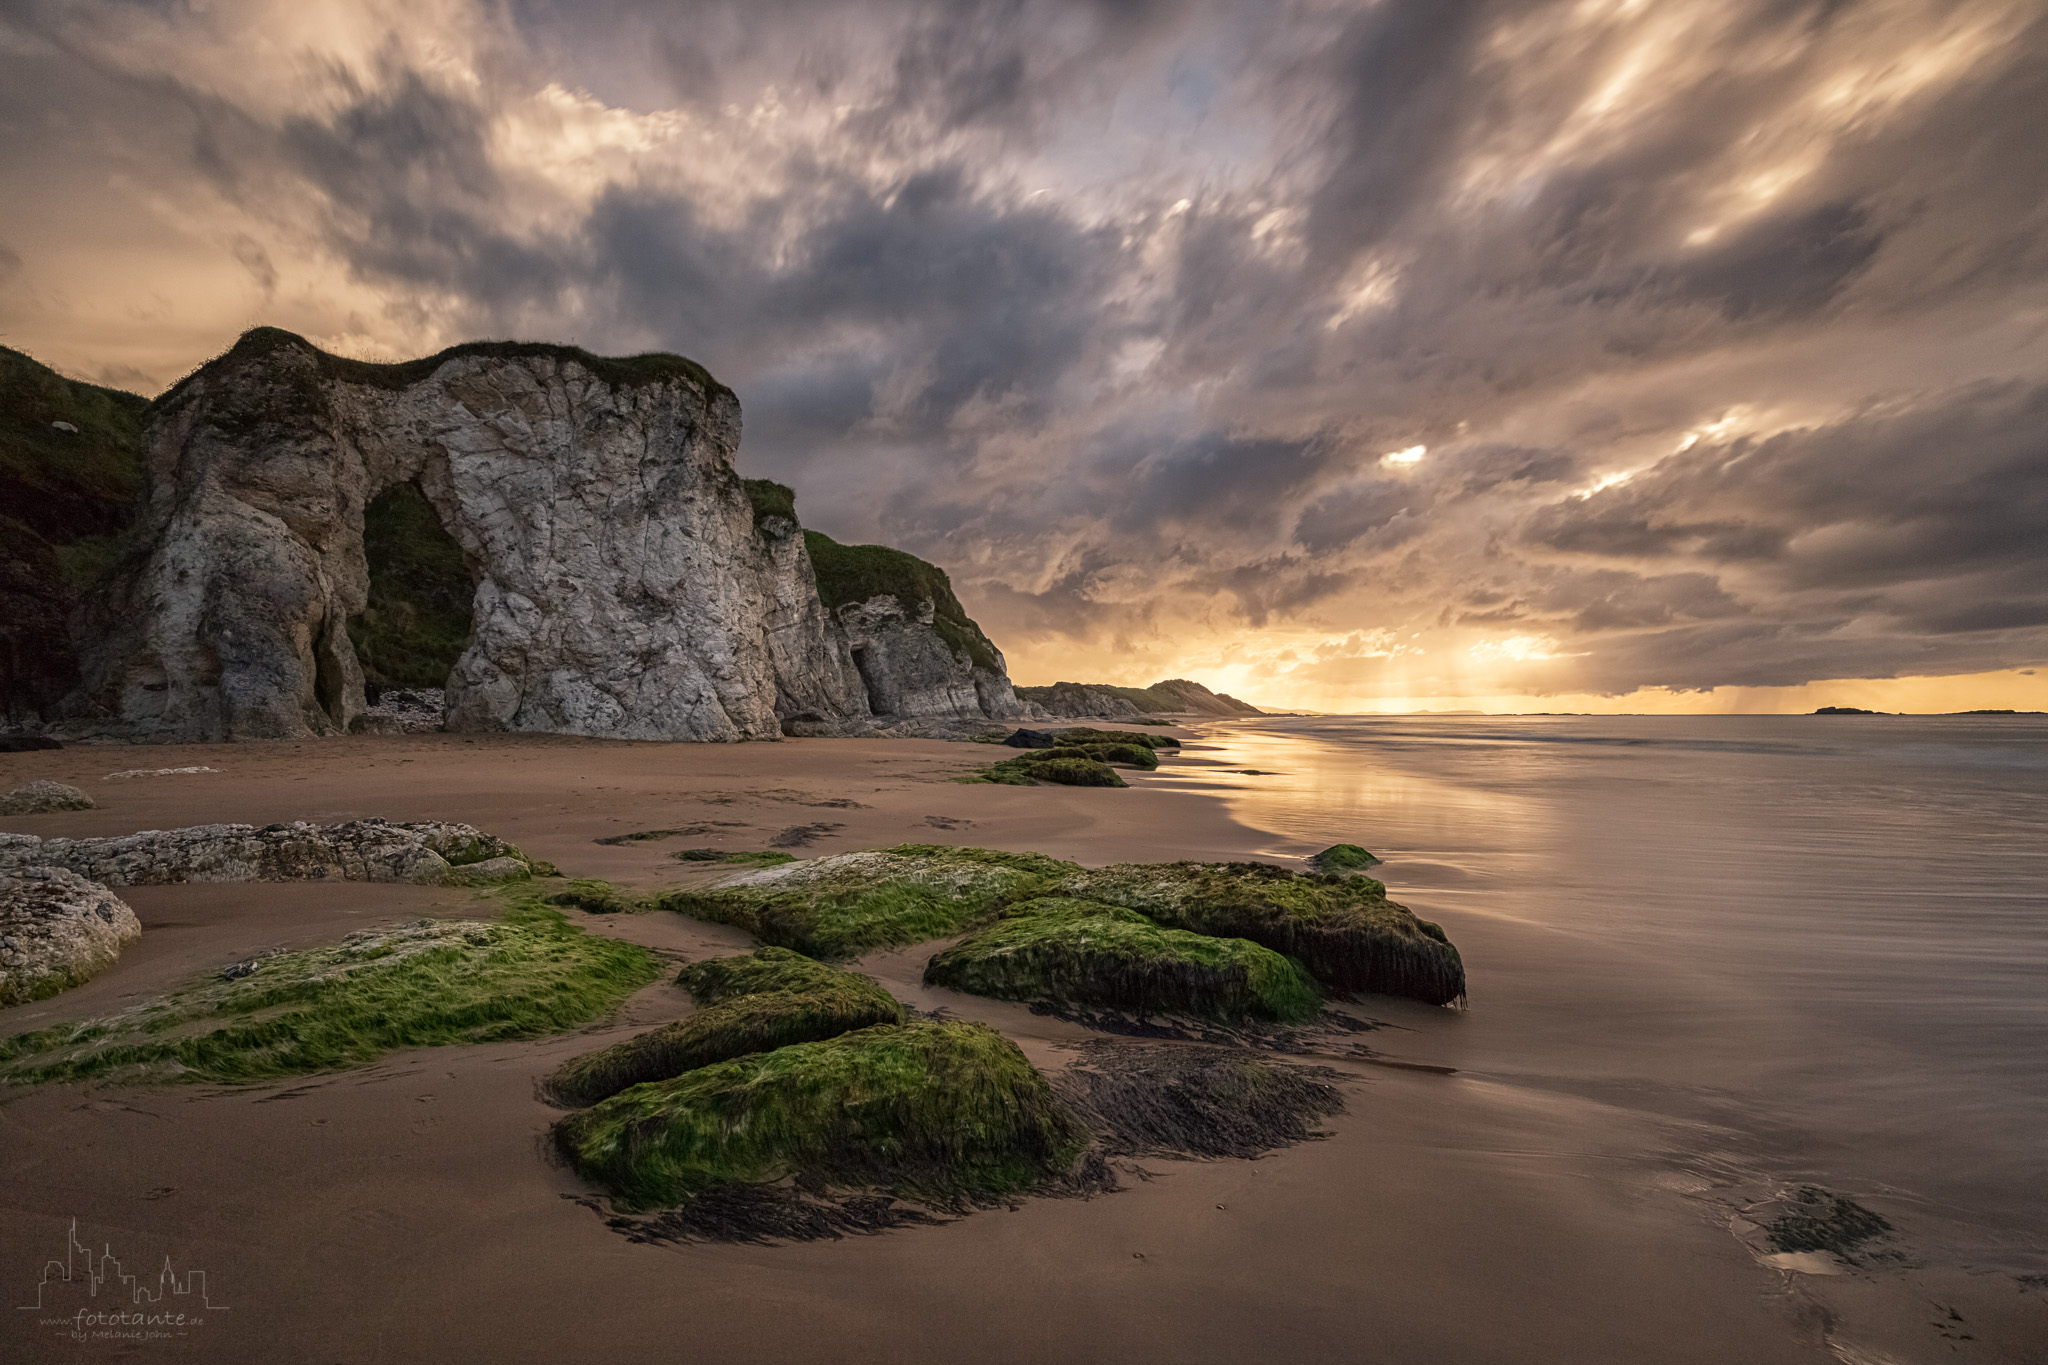 Whiterocks Beach sunset, United Kingdom